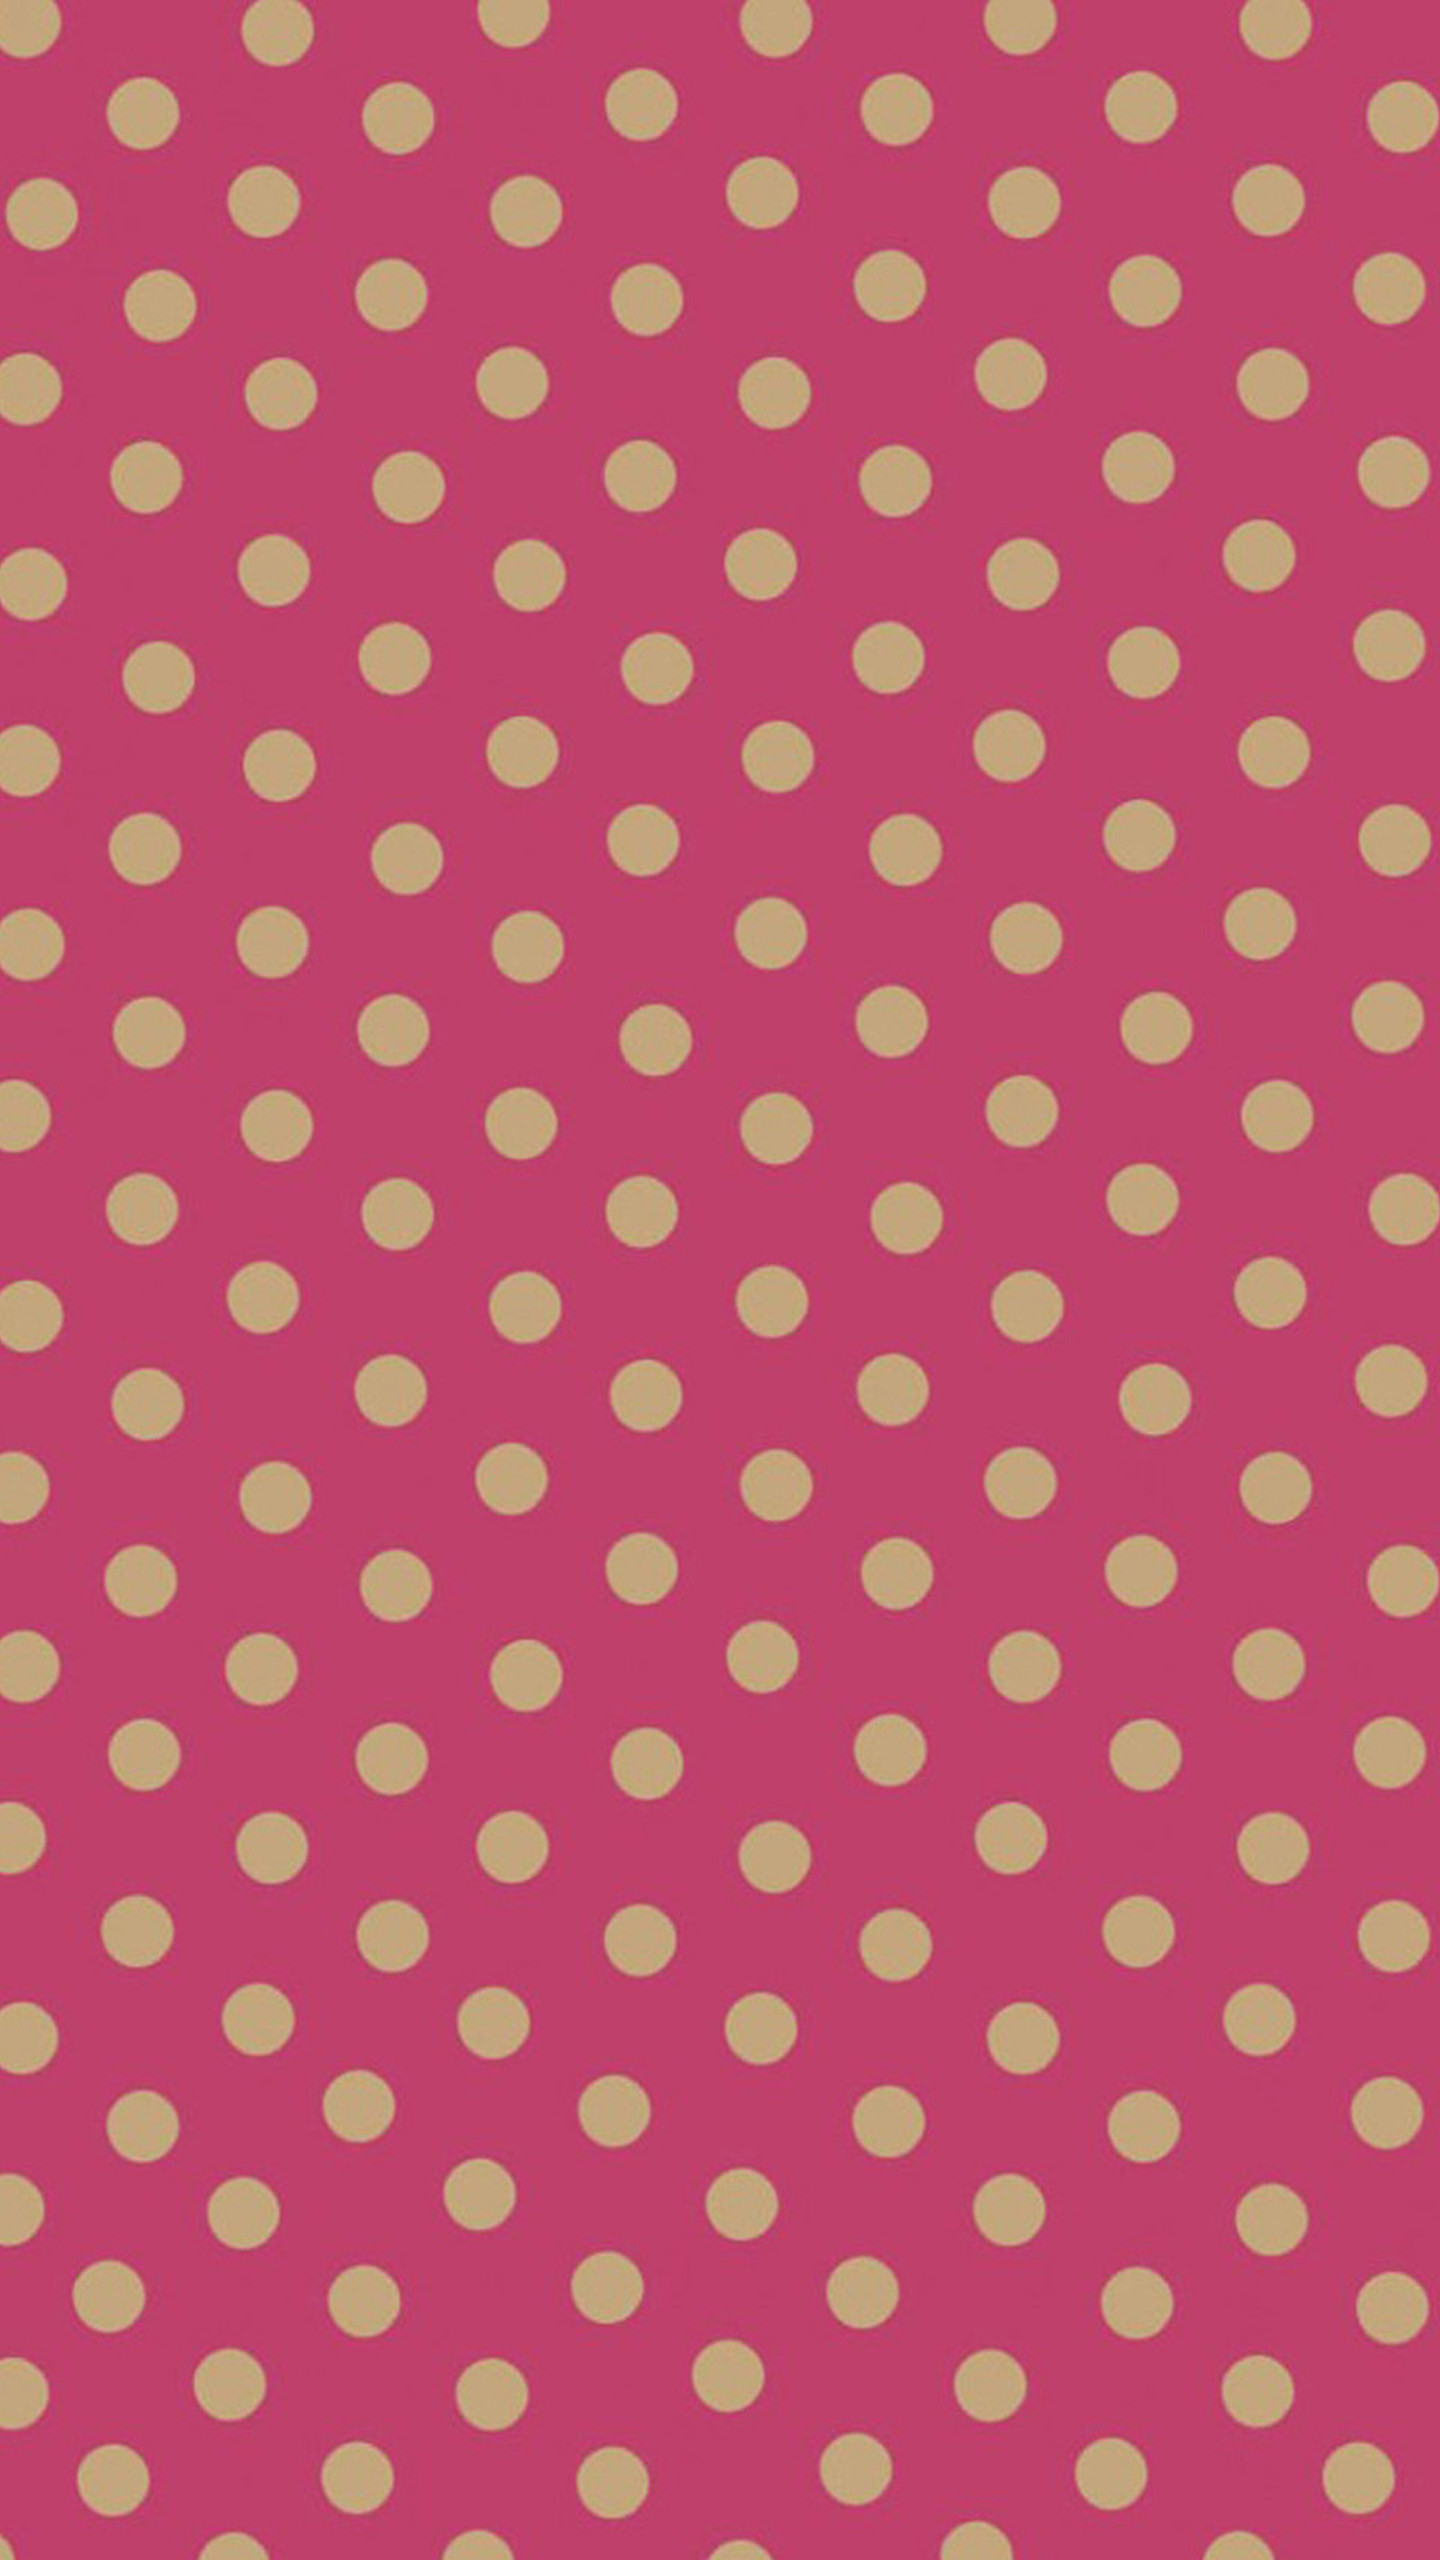 Polka Dot pattern Galaxy Note 4 Wallpapers